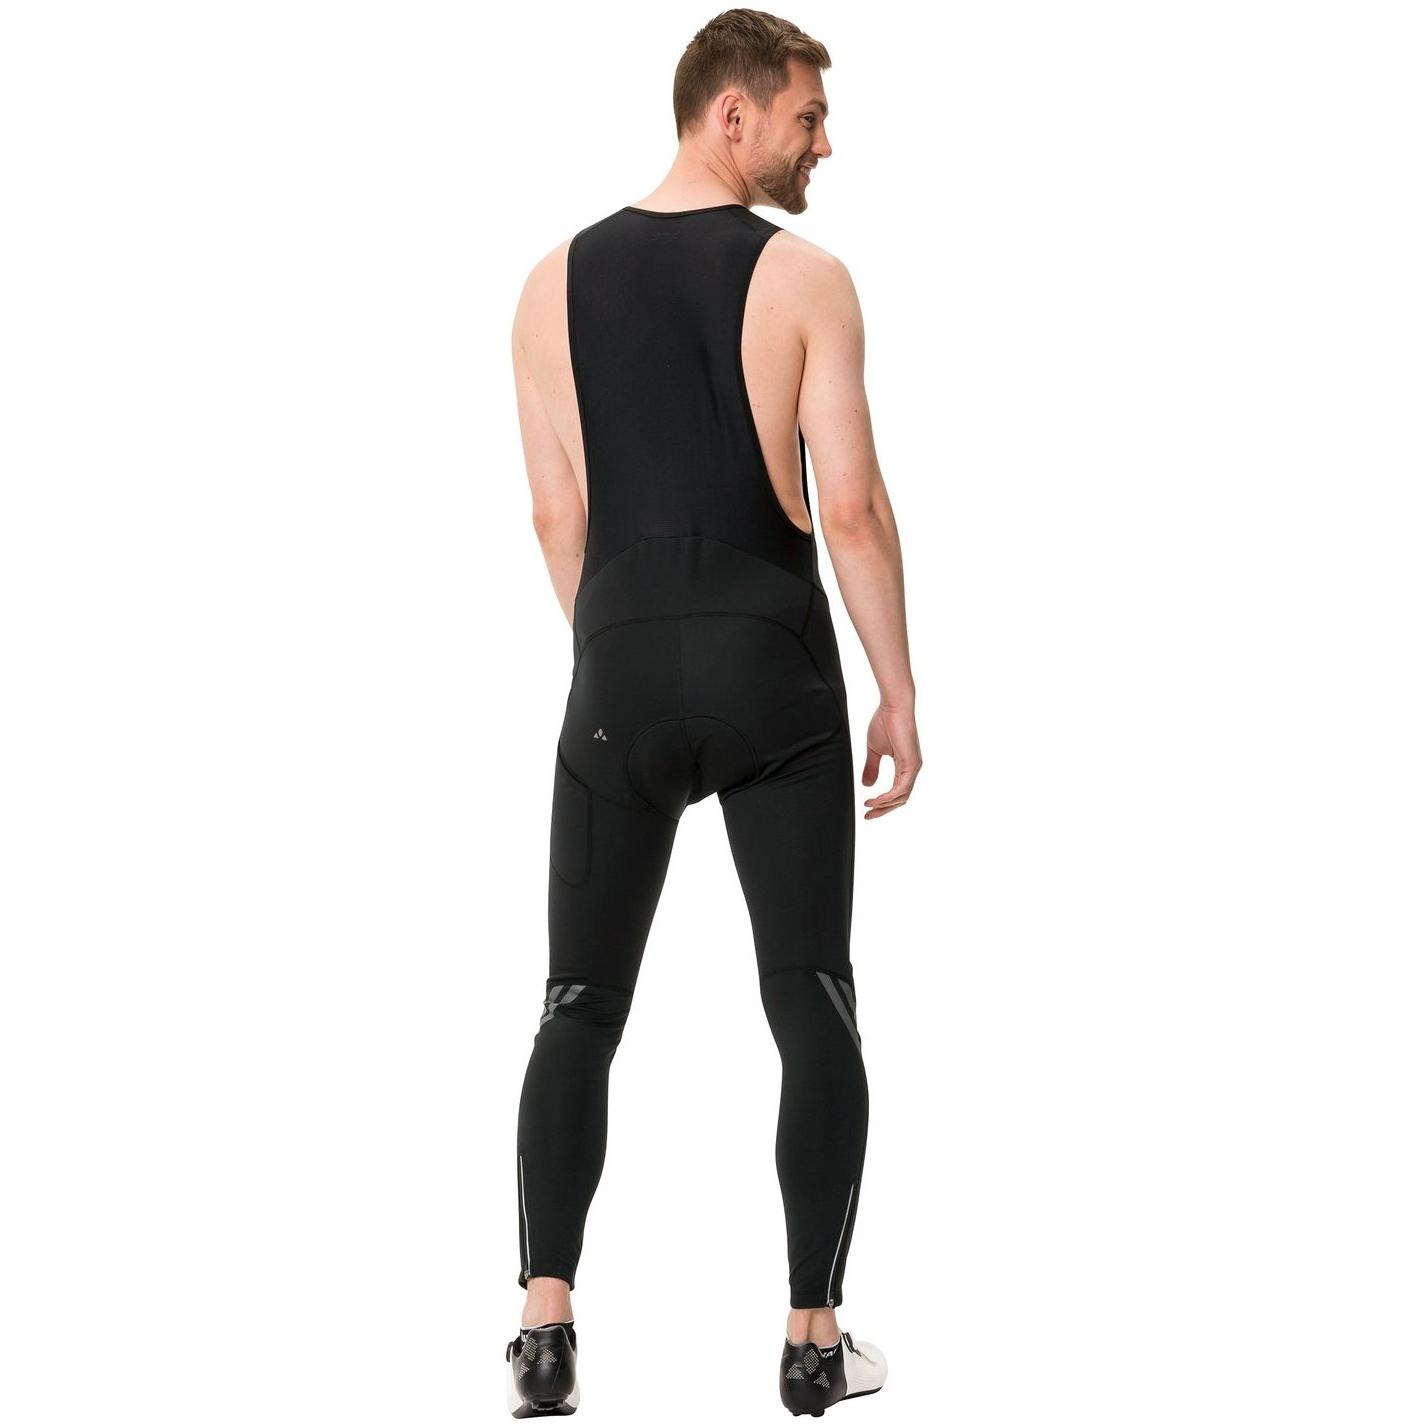 Image of Vaude Men's Posta Warm Bib Tights - black